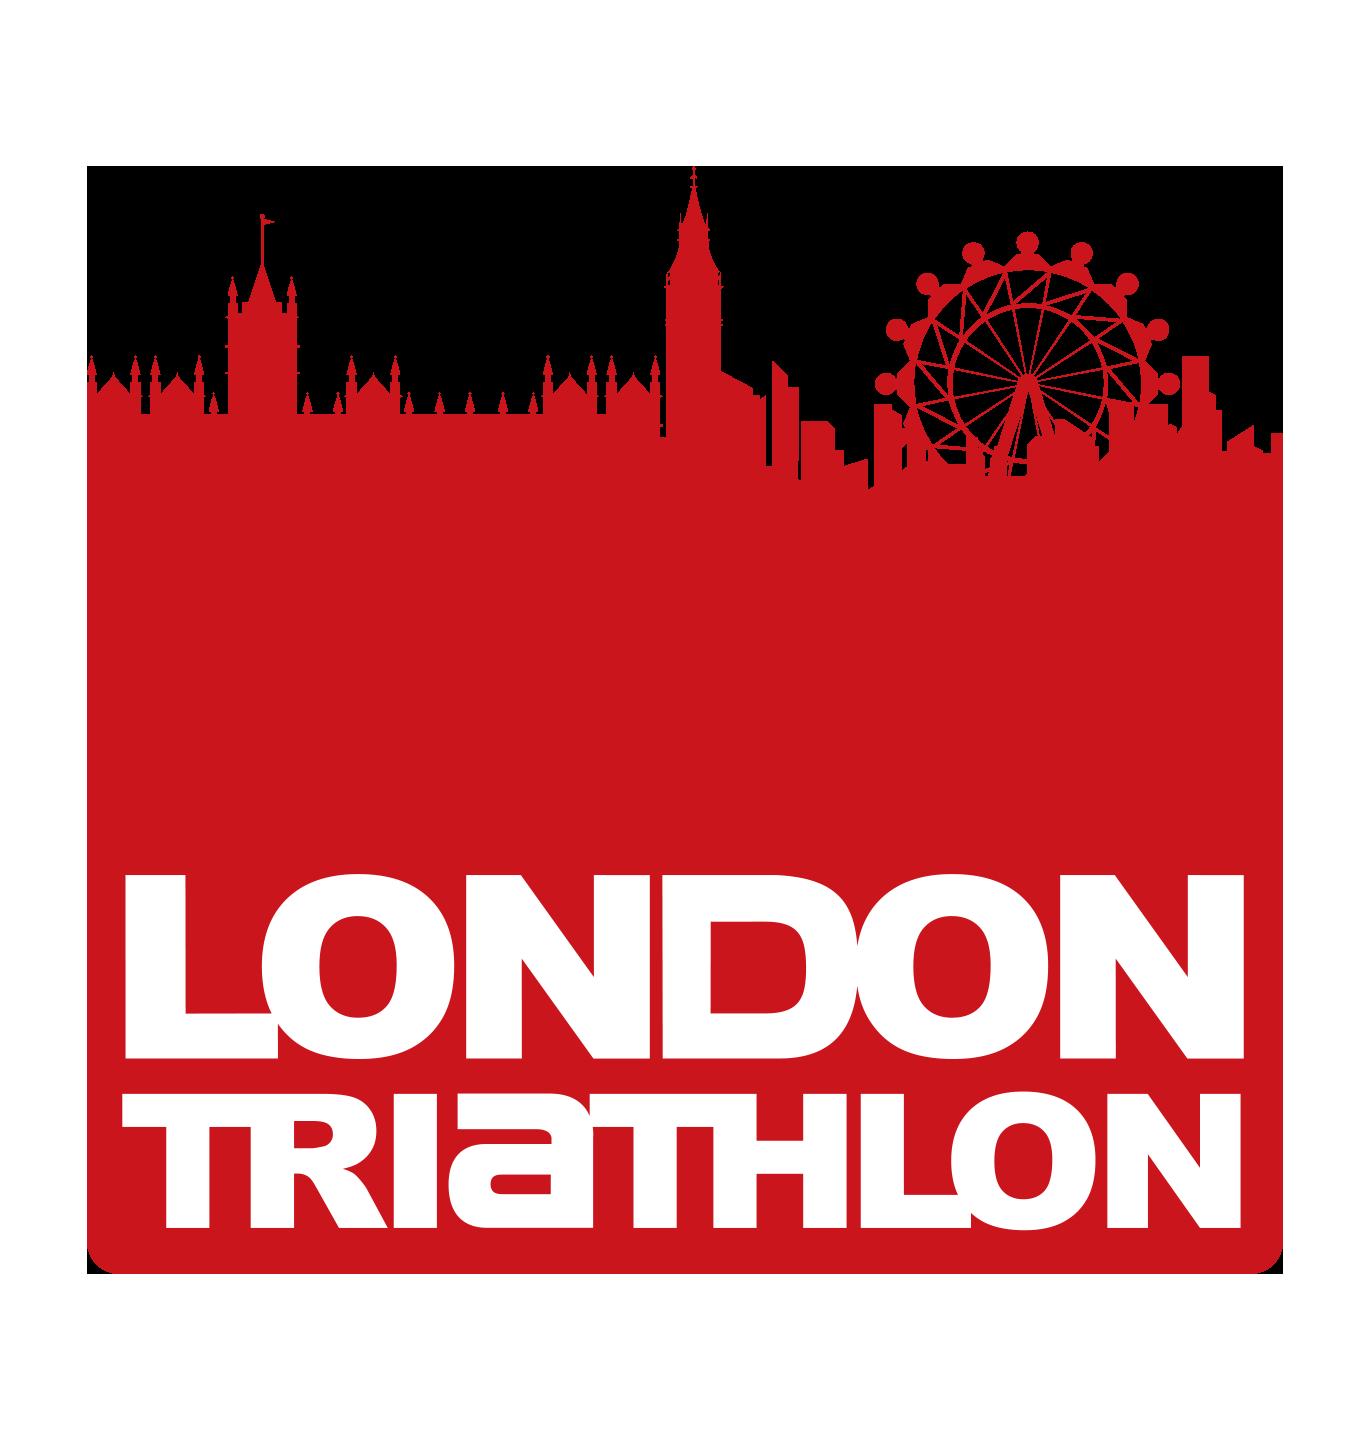 The London Triathlon (Saturday - Olympic Distance)